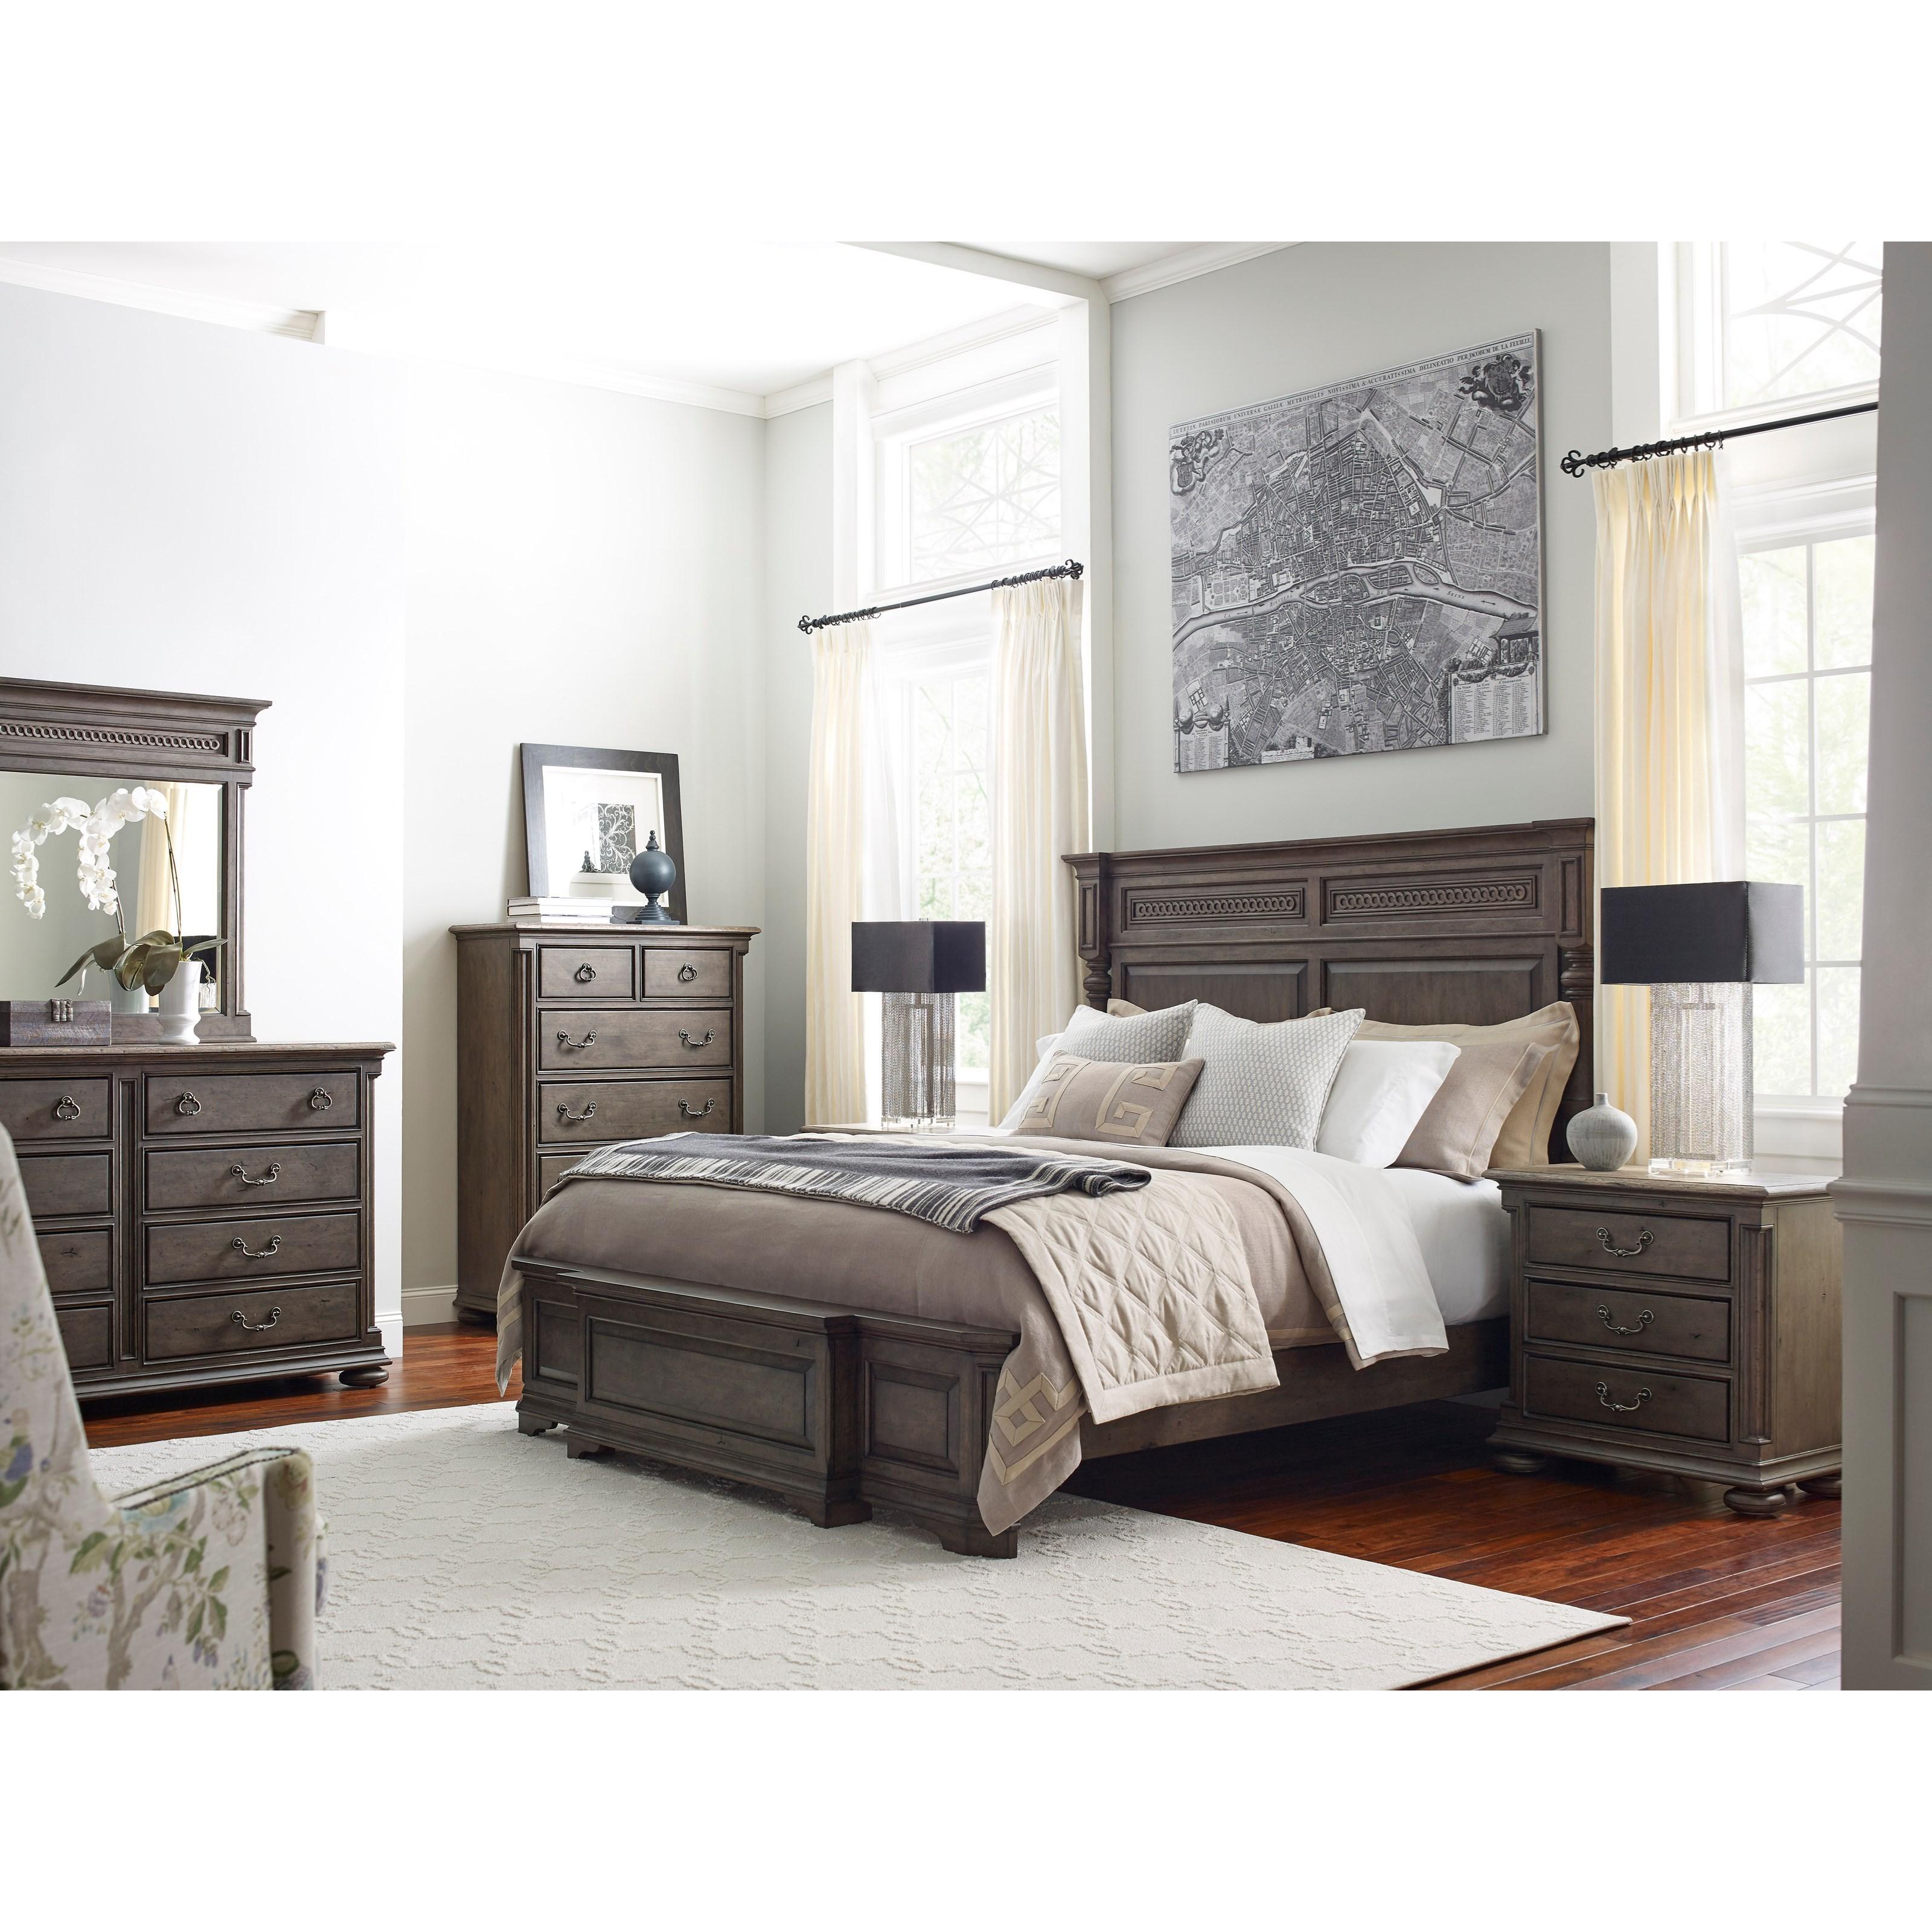 Kincaid Furniture Greyson Austin Eight Drawer Dresser Johnny Janosik Dressers